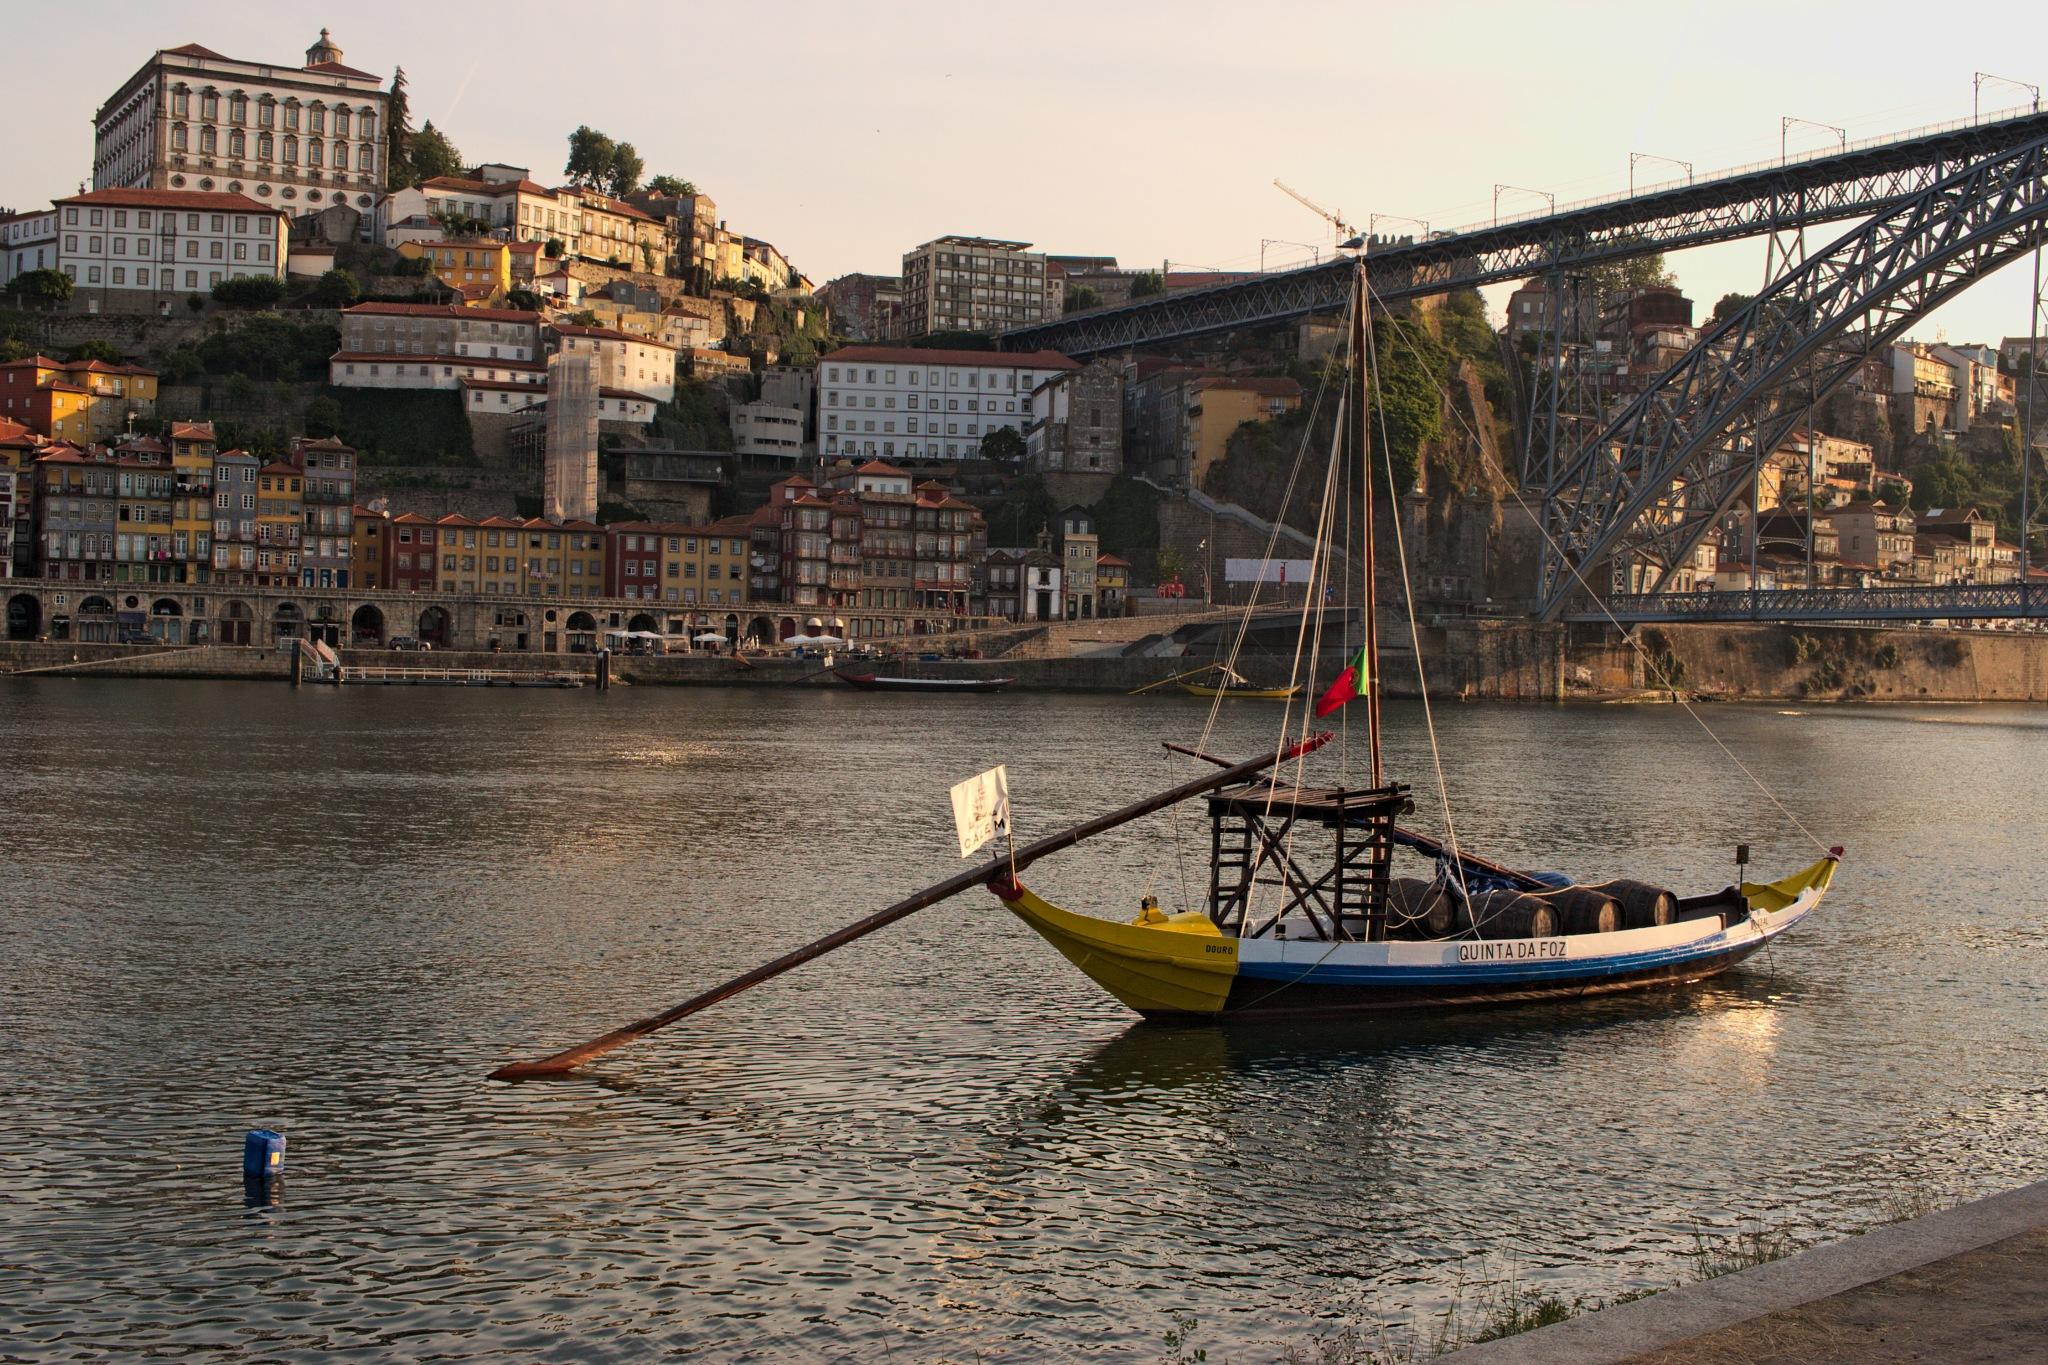 A rebelo boat on the Duoro River near Luiz I Bridge by Alexey Zalesny